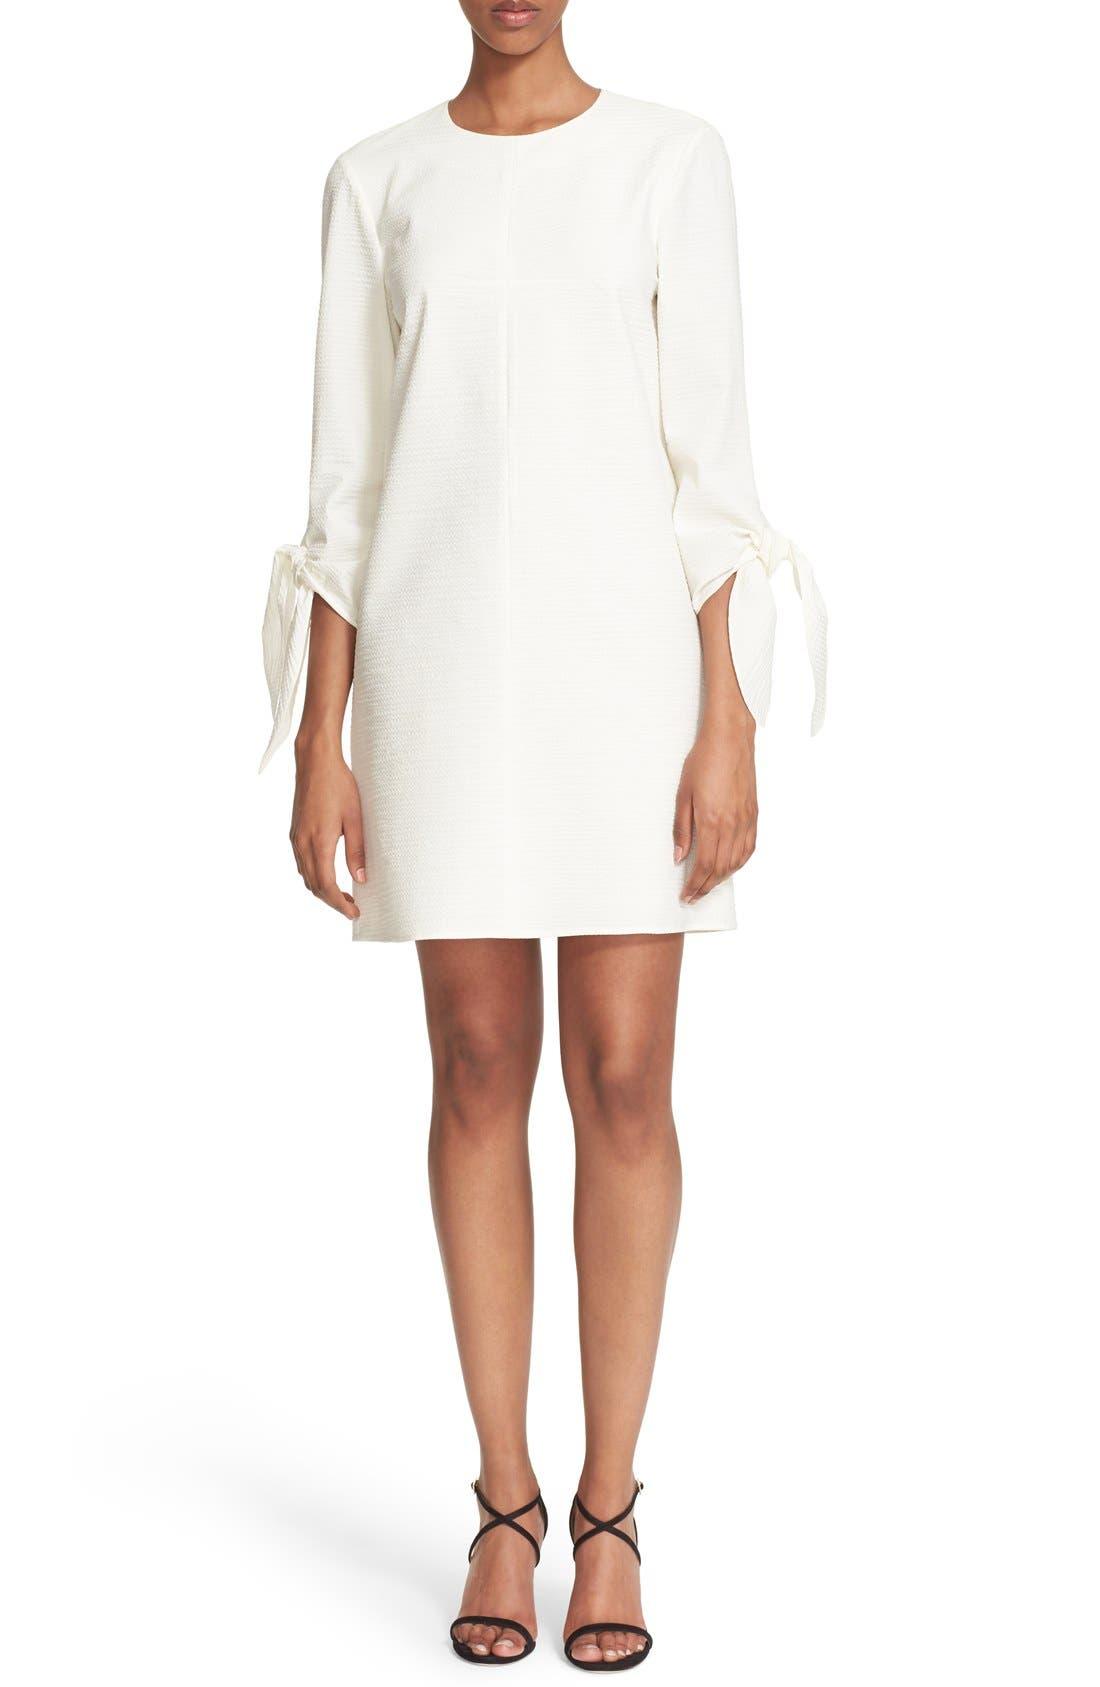 TIBI Tie Sleeve Textured Cotton Blend Shift Dress, Main, color, 100